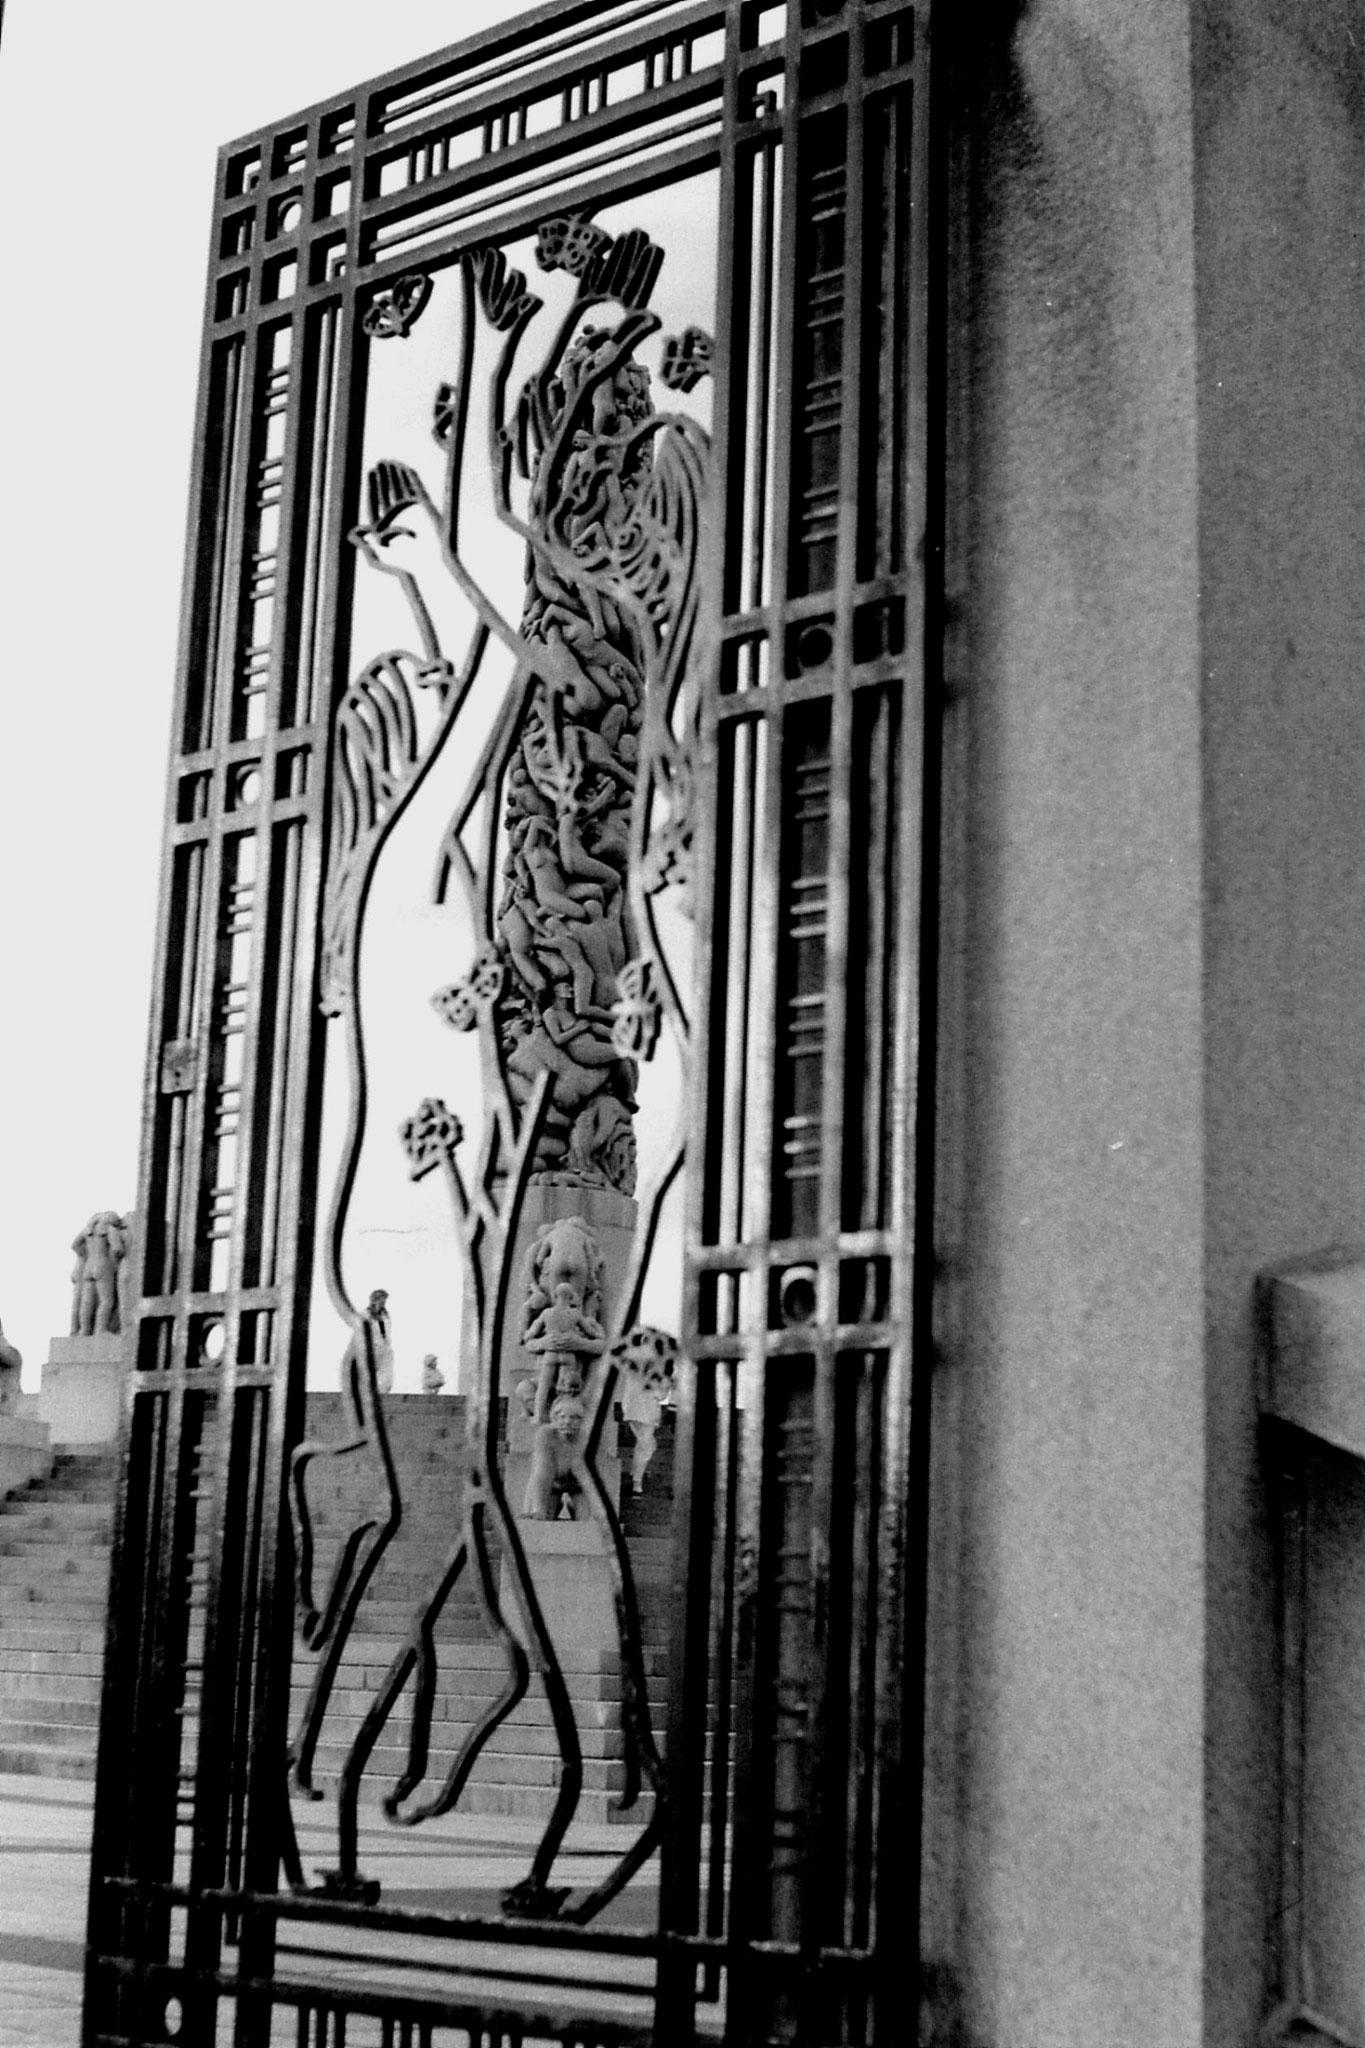 17/9/1988: 13: Vigeland sculpture park